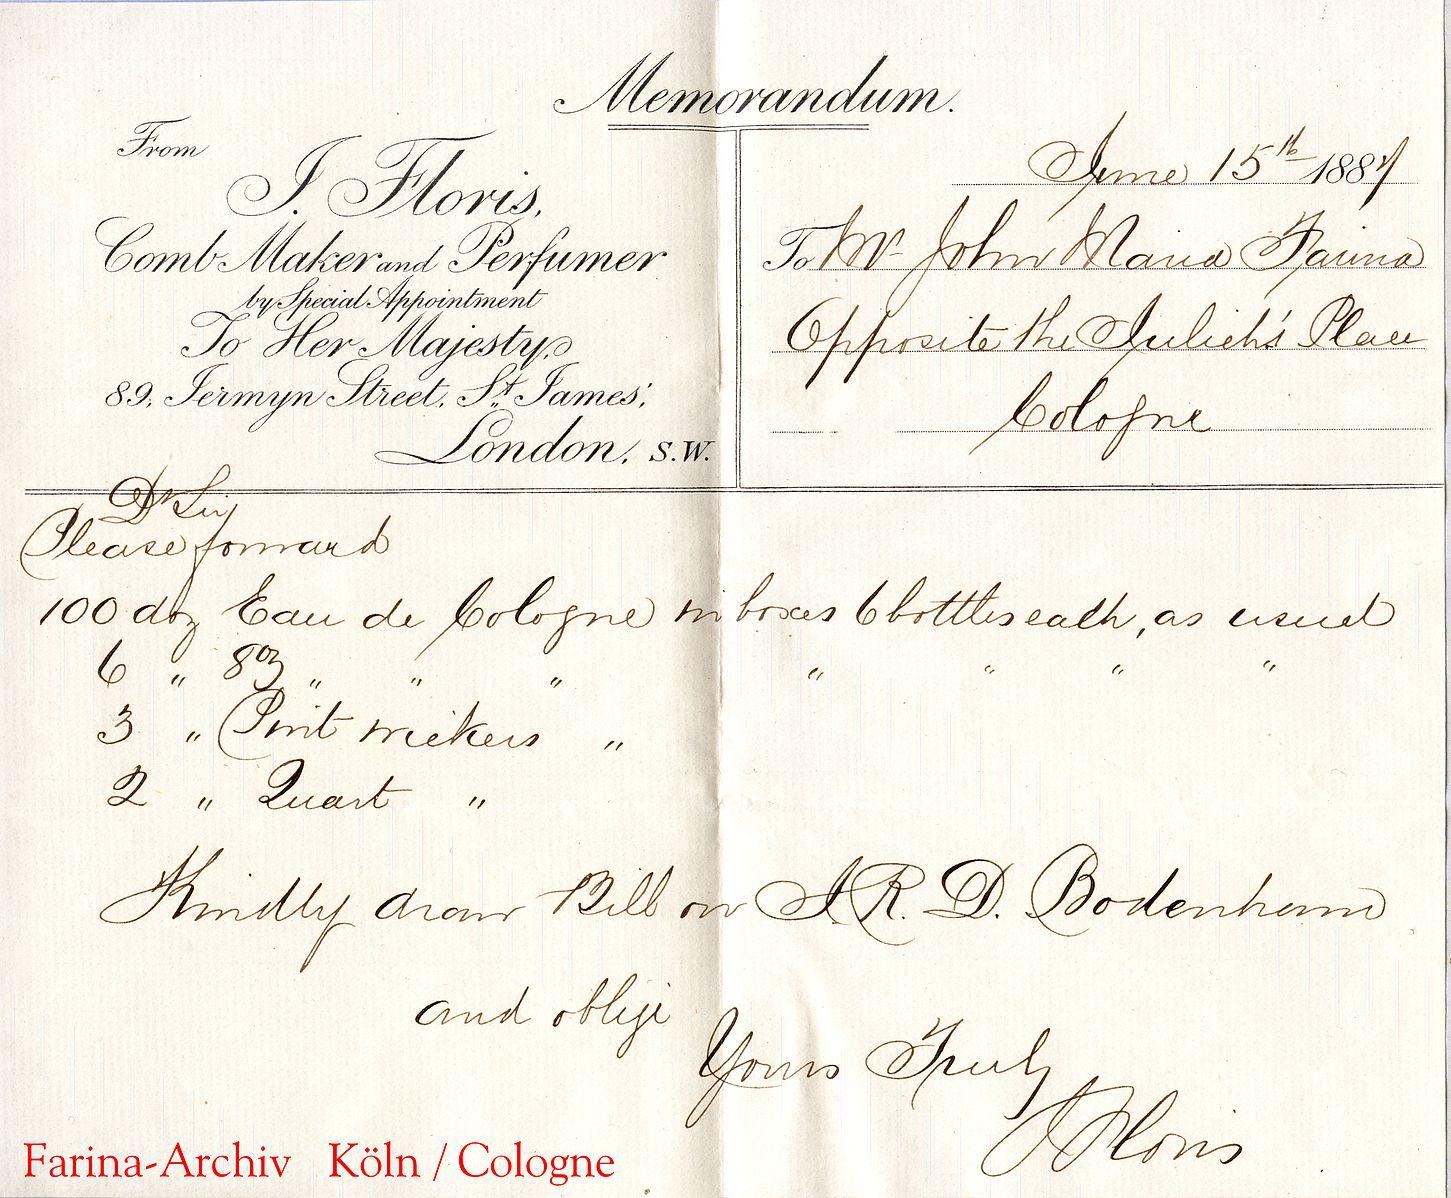 Fig. 2: Order from London perfumer Floris to Johann Maria Farina, Cologne, 1887. Image courtesy of Farina Archive and WikiMedia Commons.